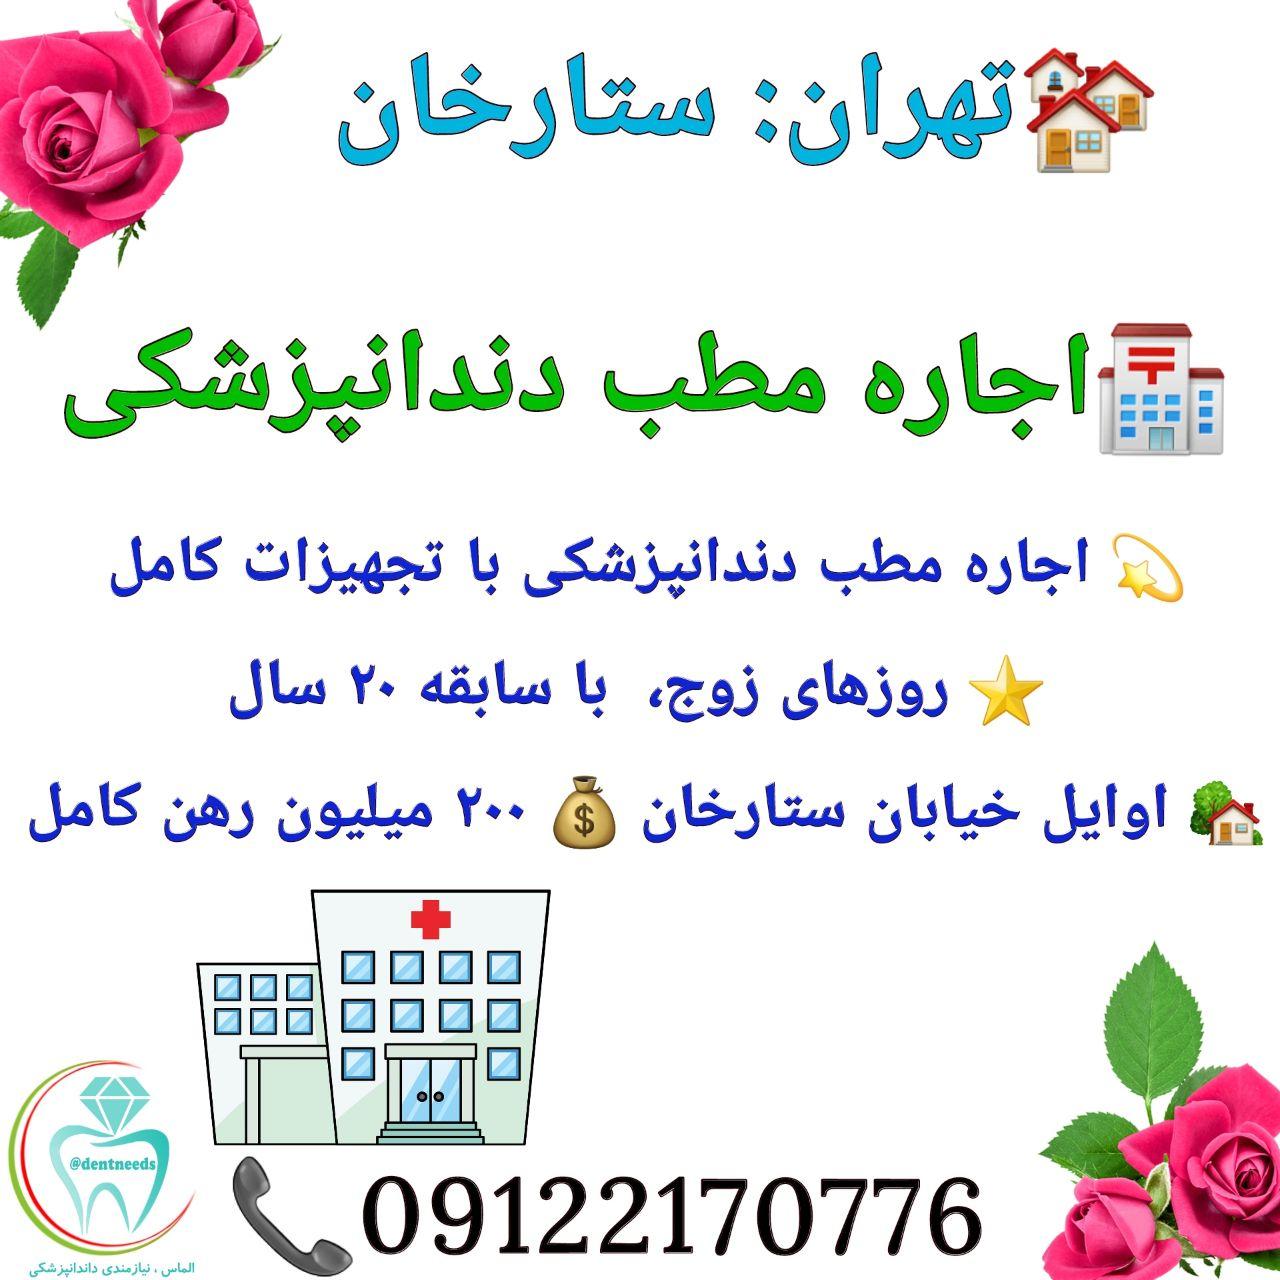 تهران: ستارخان، اجاره مطب دندانپزشکی